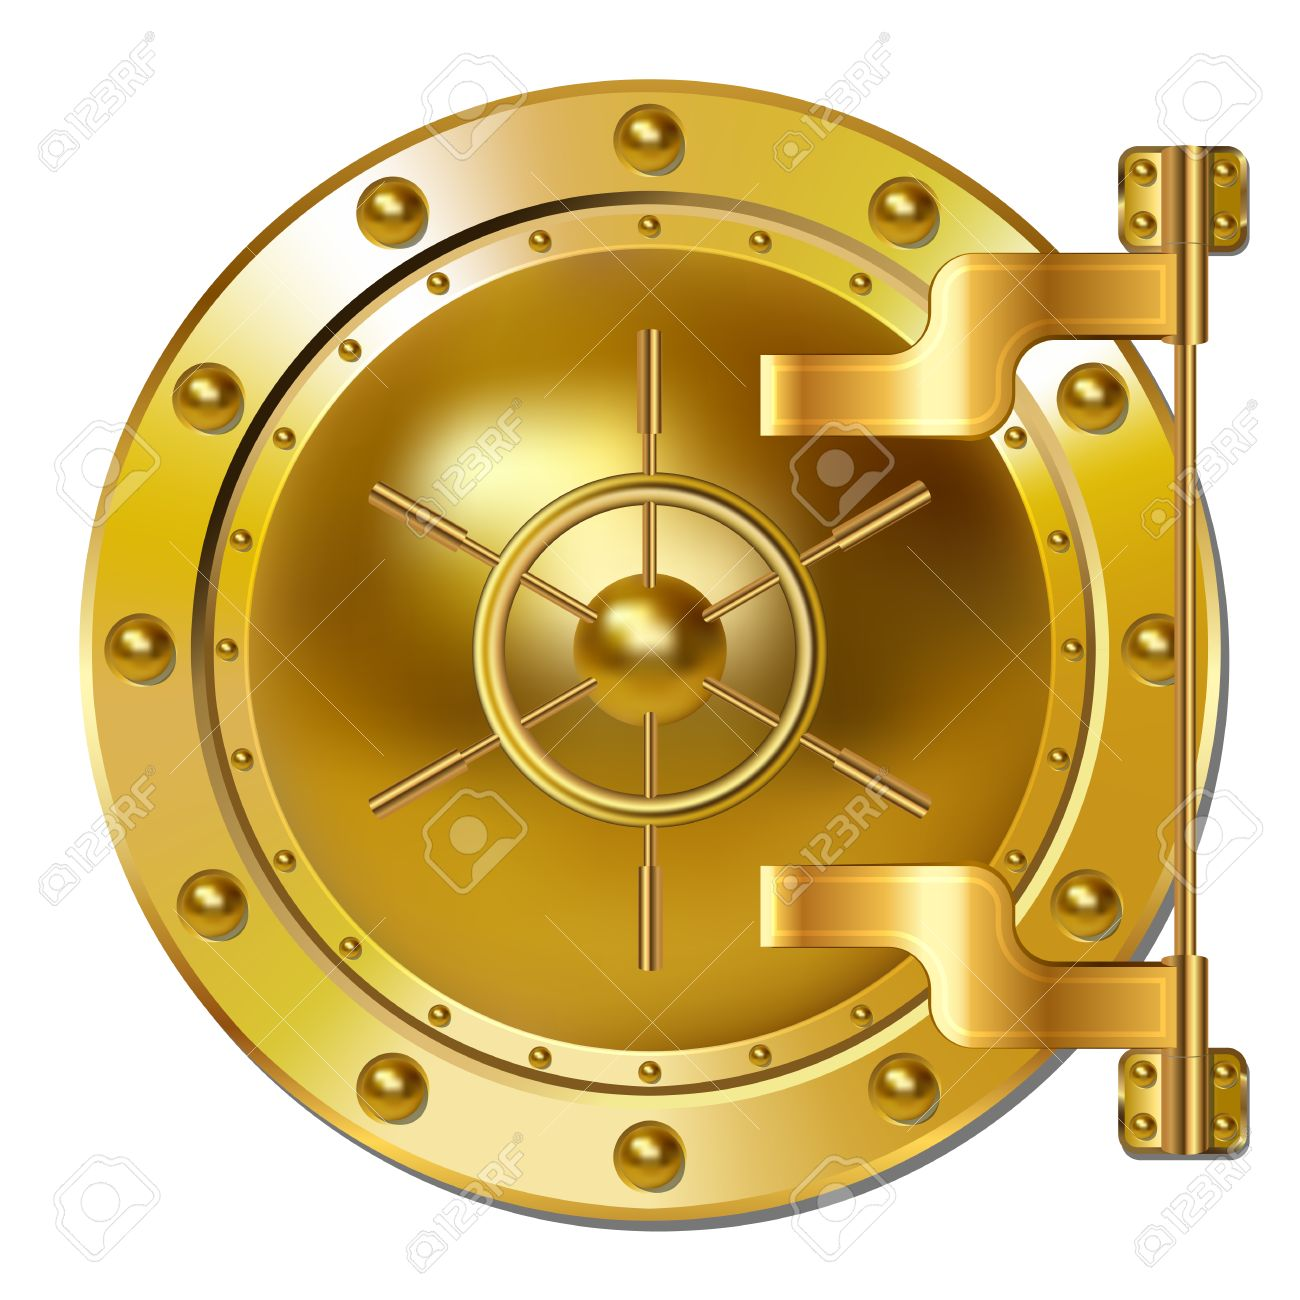 Gold Bank Vault Door Royalty Free Cliparts, Vectors, And Stock.